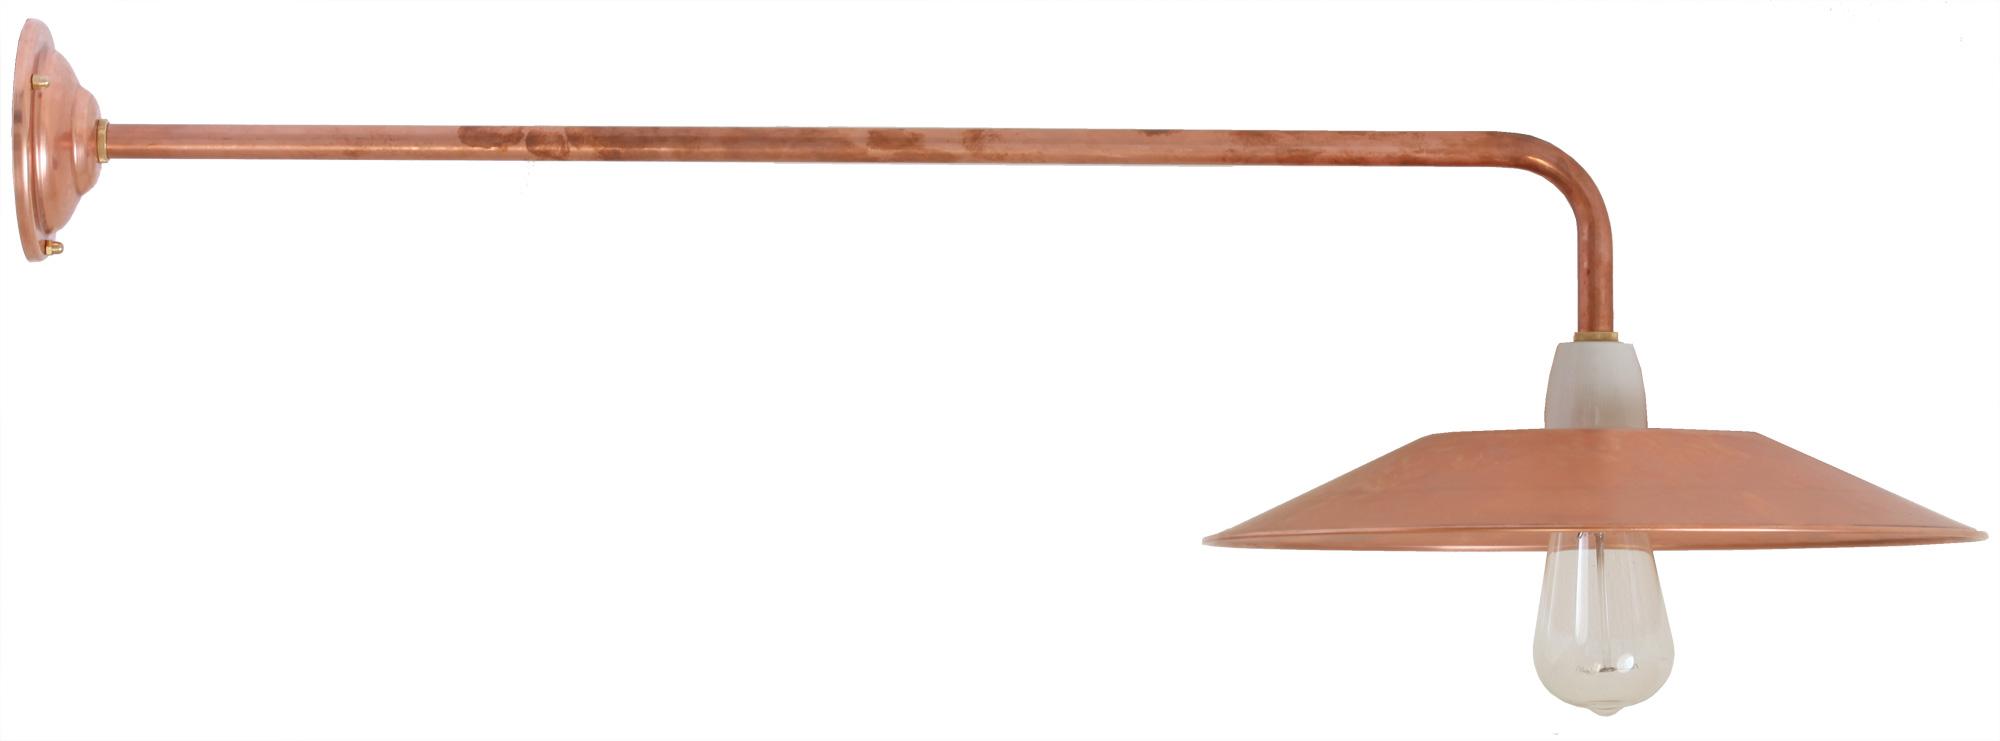 kupfer wandlampe mit flachem reflektor bonn ro 130 terra lumi. Black Bedroom Furniture Sets. Home Design Ideas